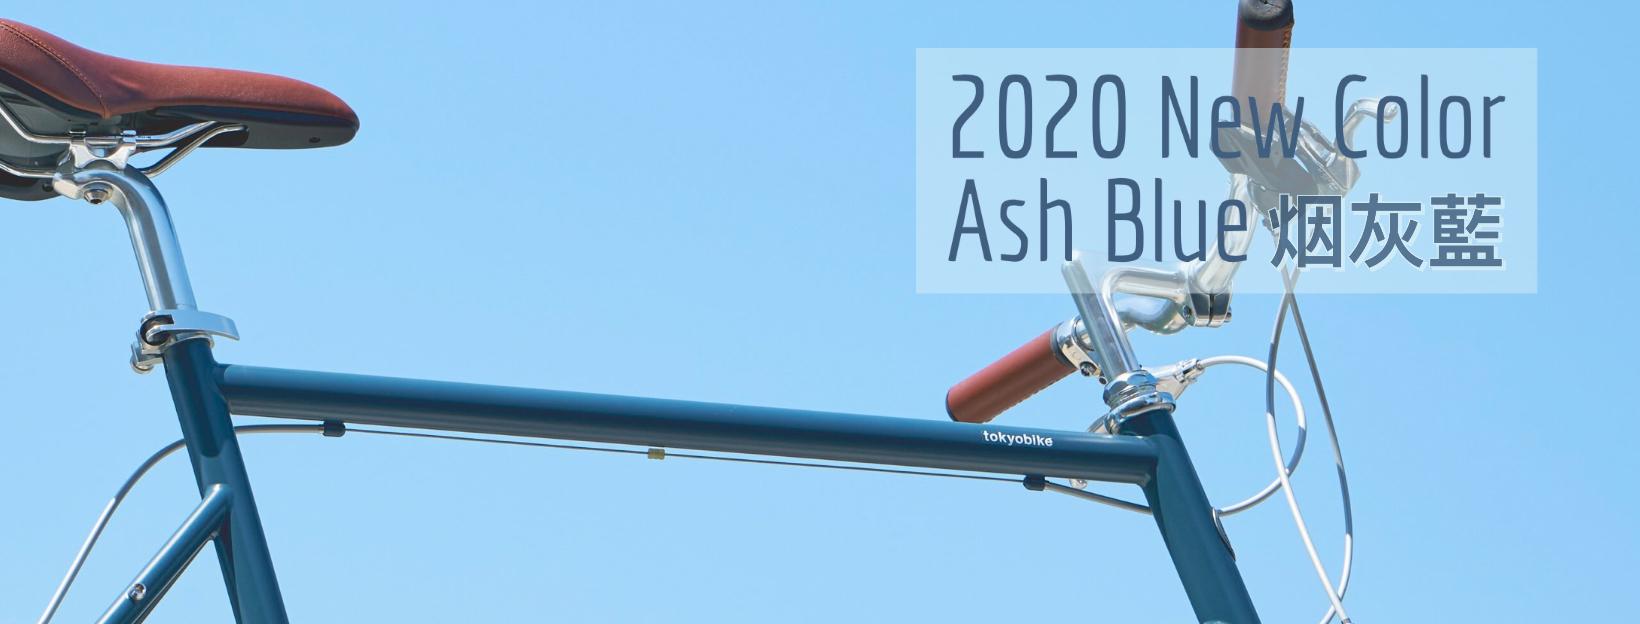 2020 tokyobike 新色烟灰藍 Ash Blue